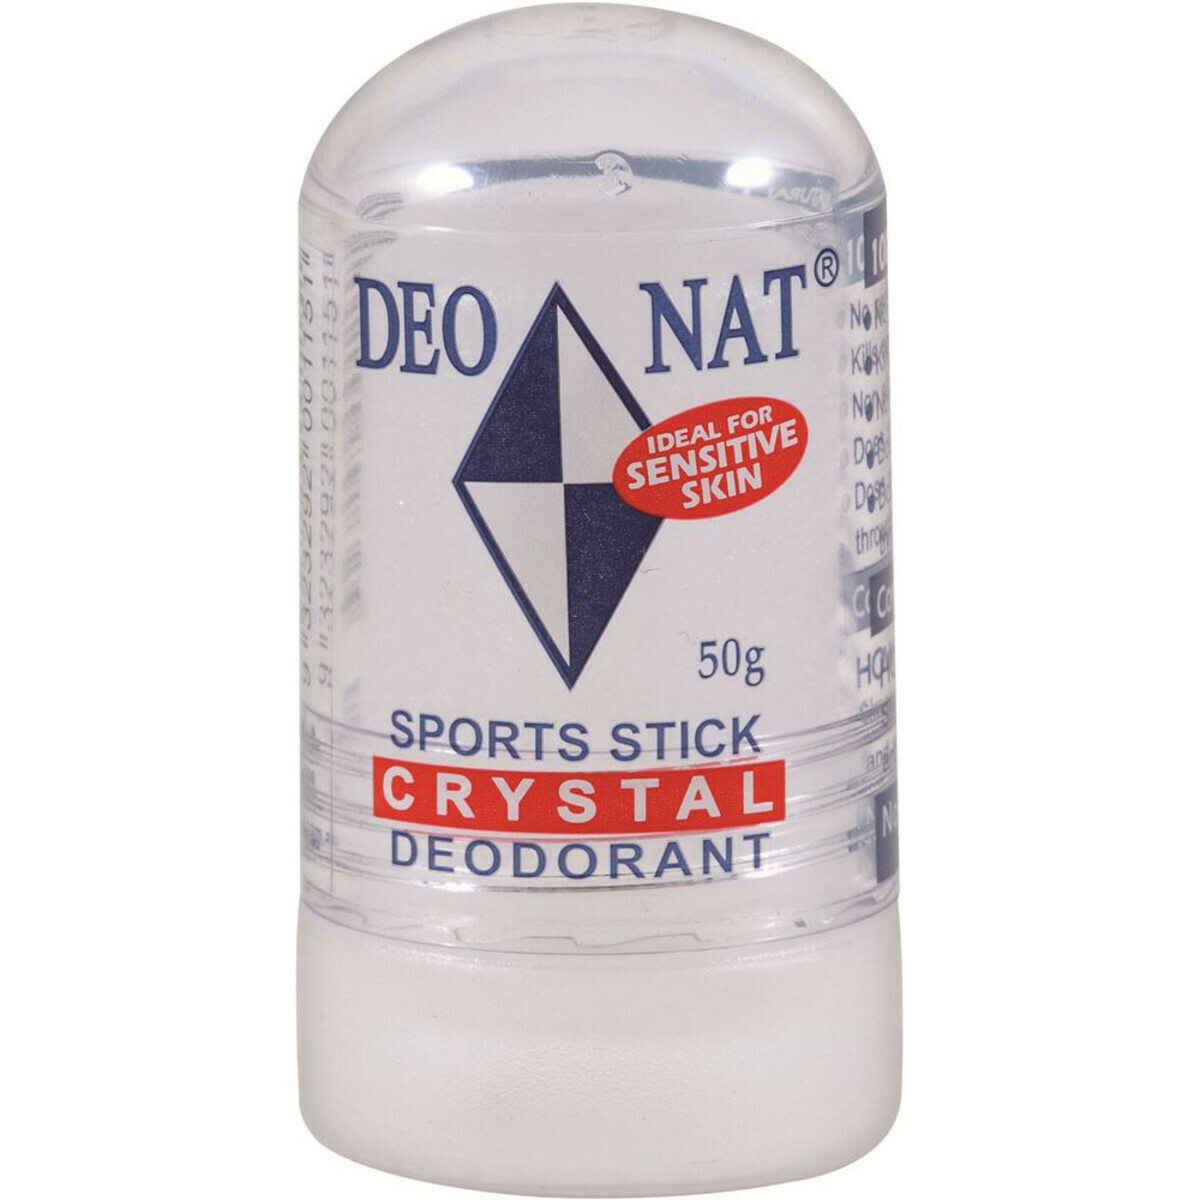 Deonat Crystal Deodorant Stick